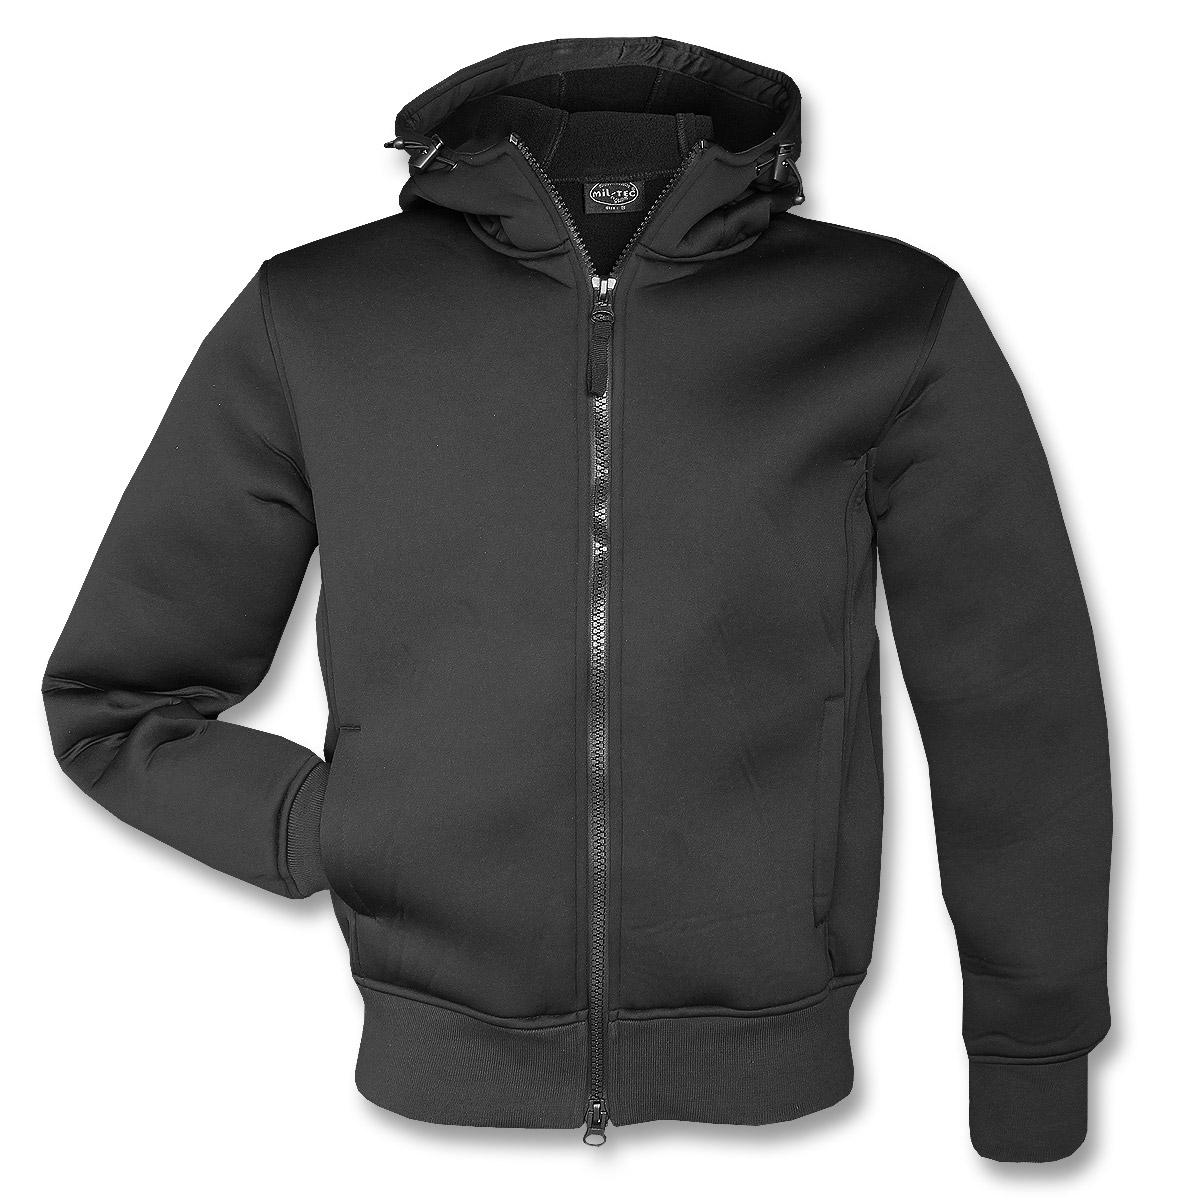 Jacken aus neopren